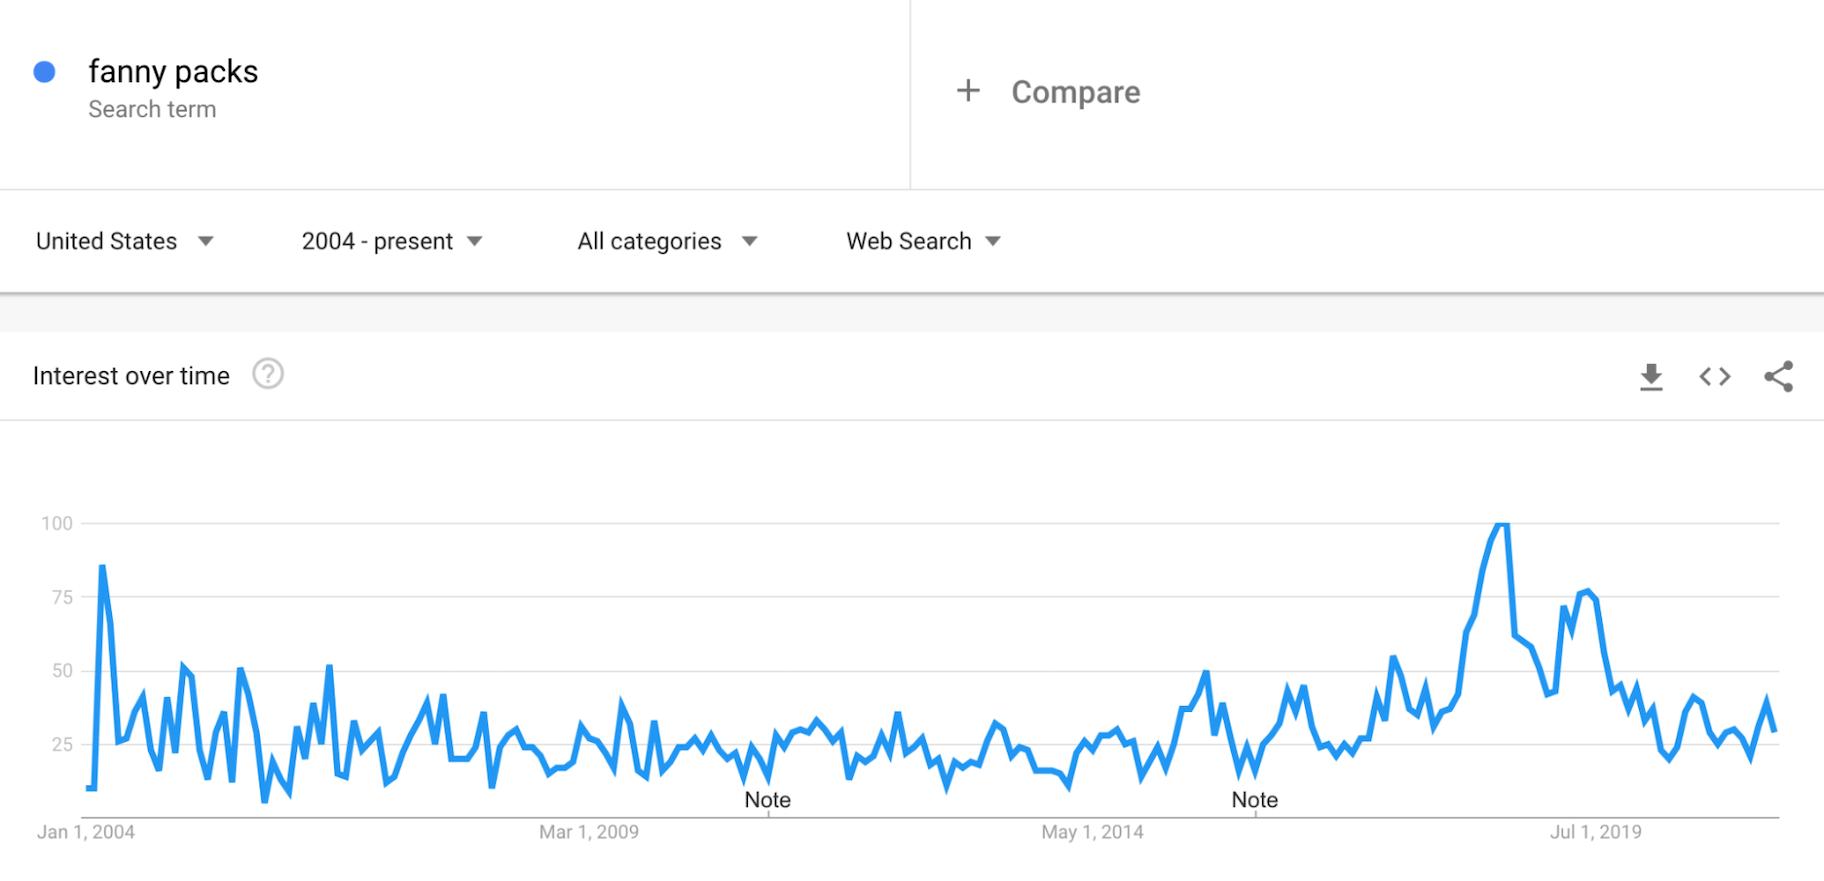 Google Trends: Fanny Packs